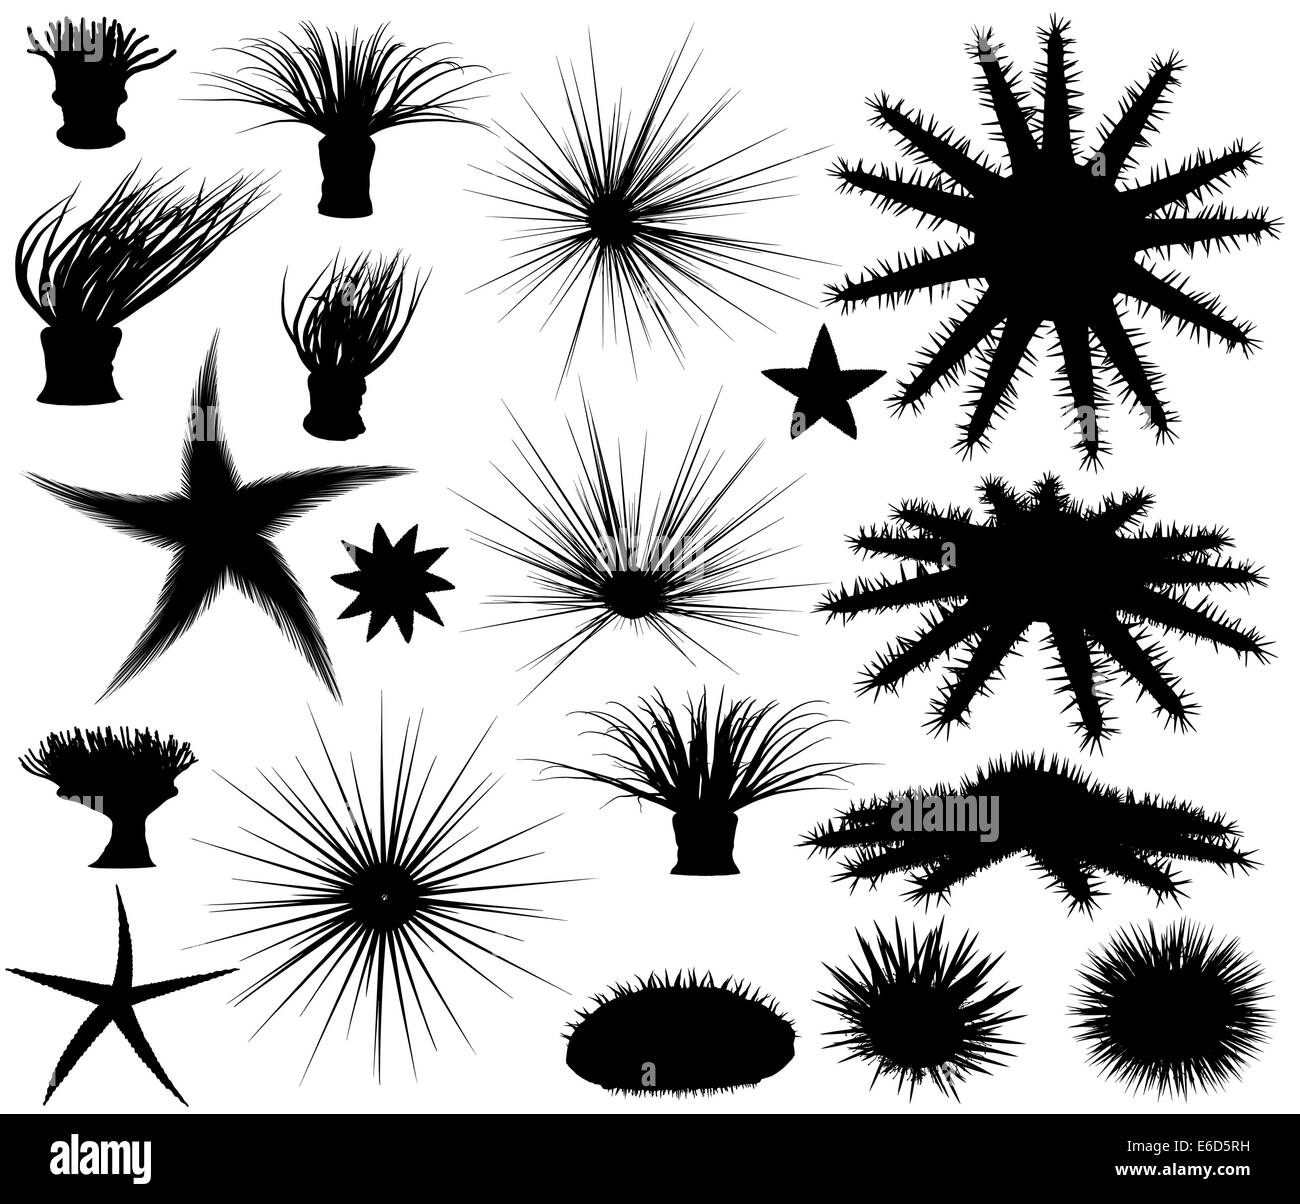 Set of editable vector silhouettes of sea lifeforms - Stock Image